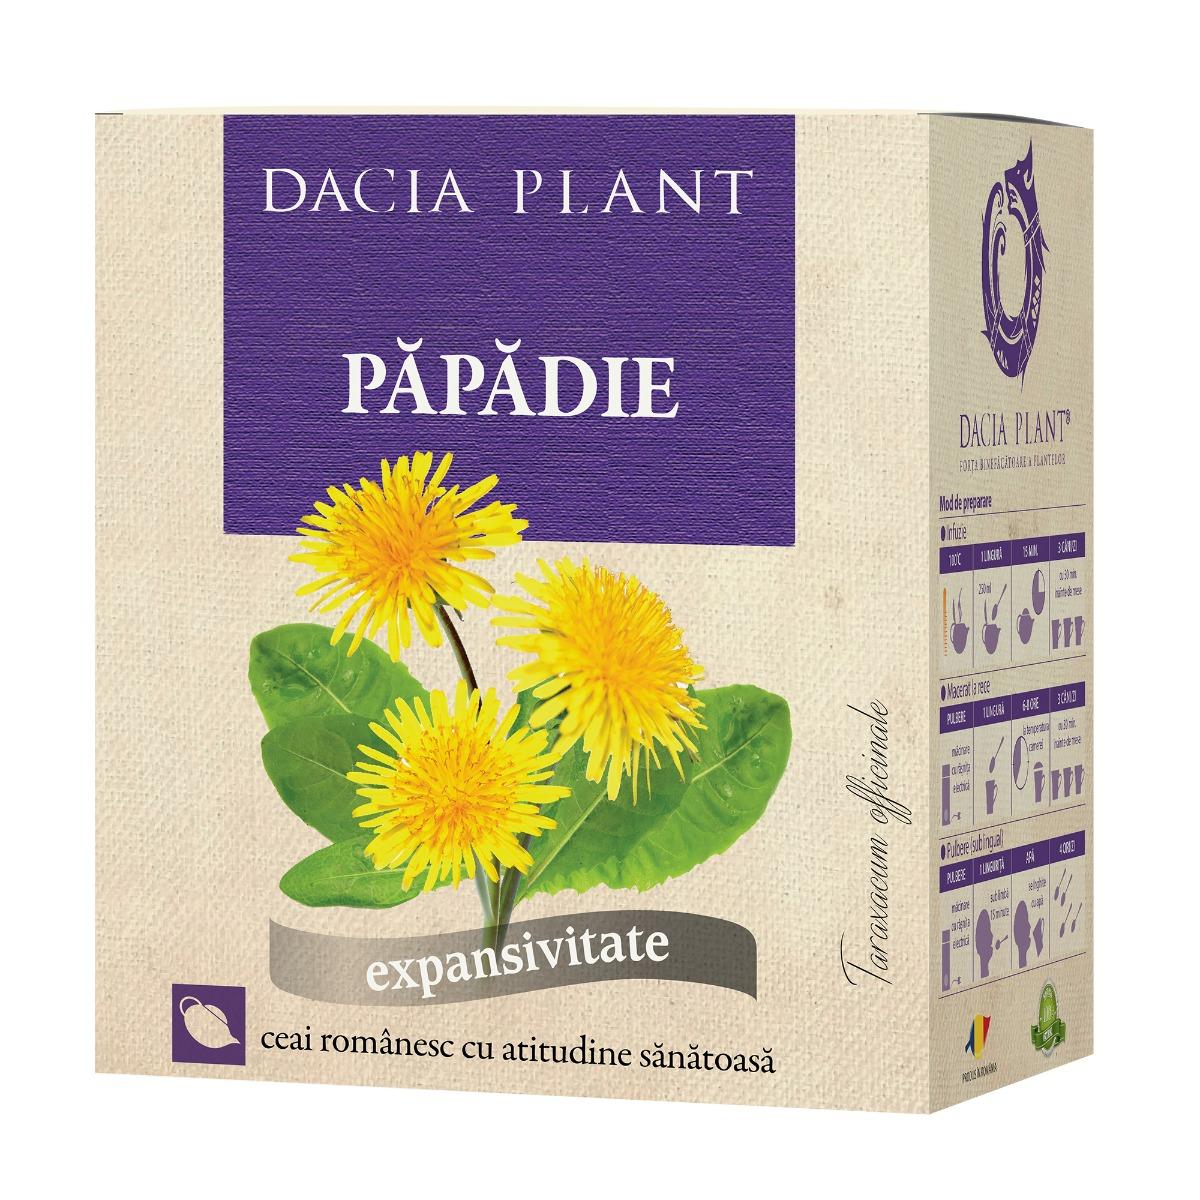 Ceai de papadie, 50g, Dacia Plant drmax.ro